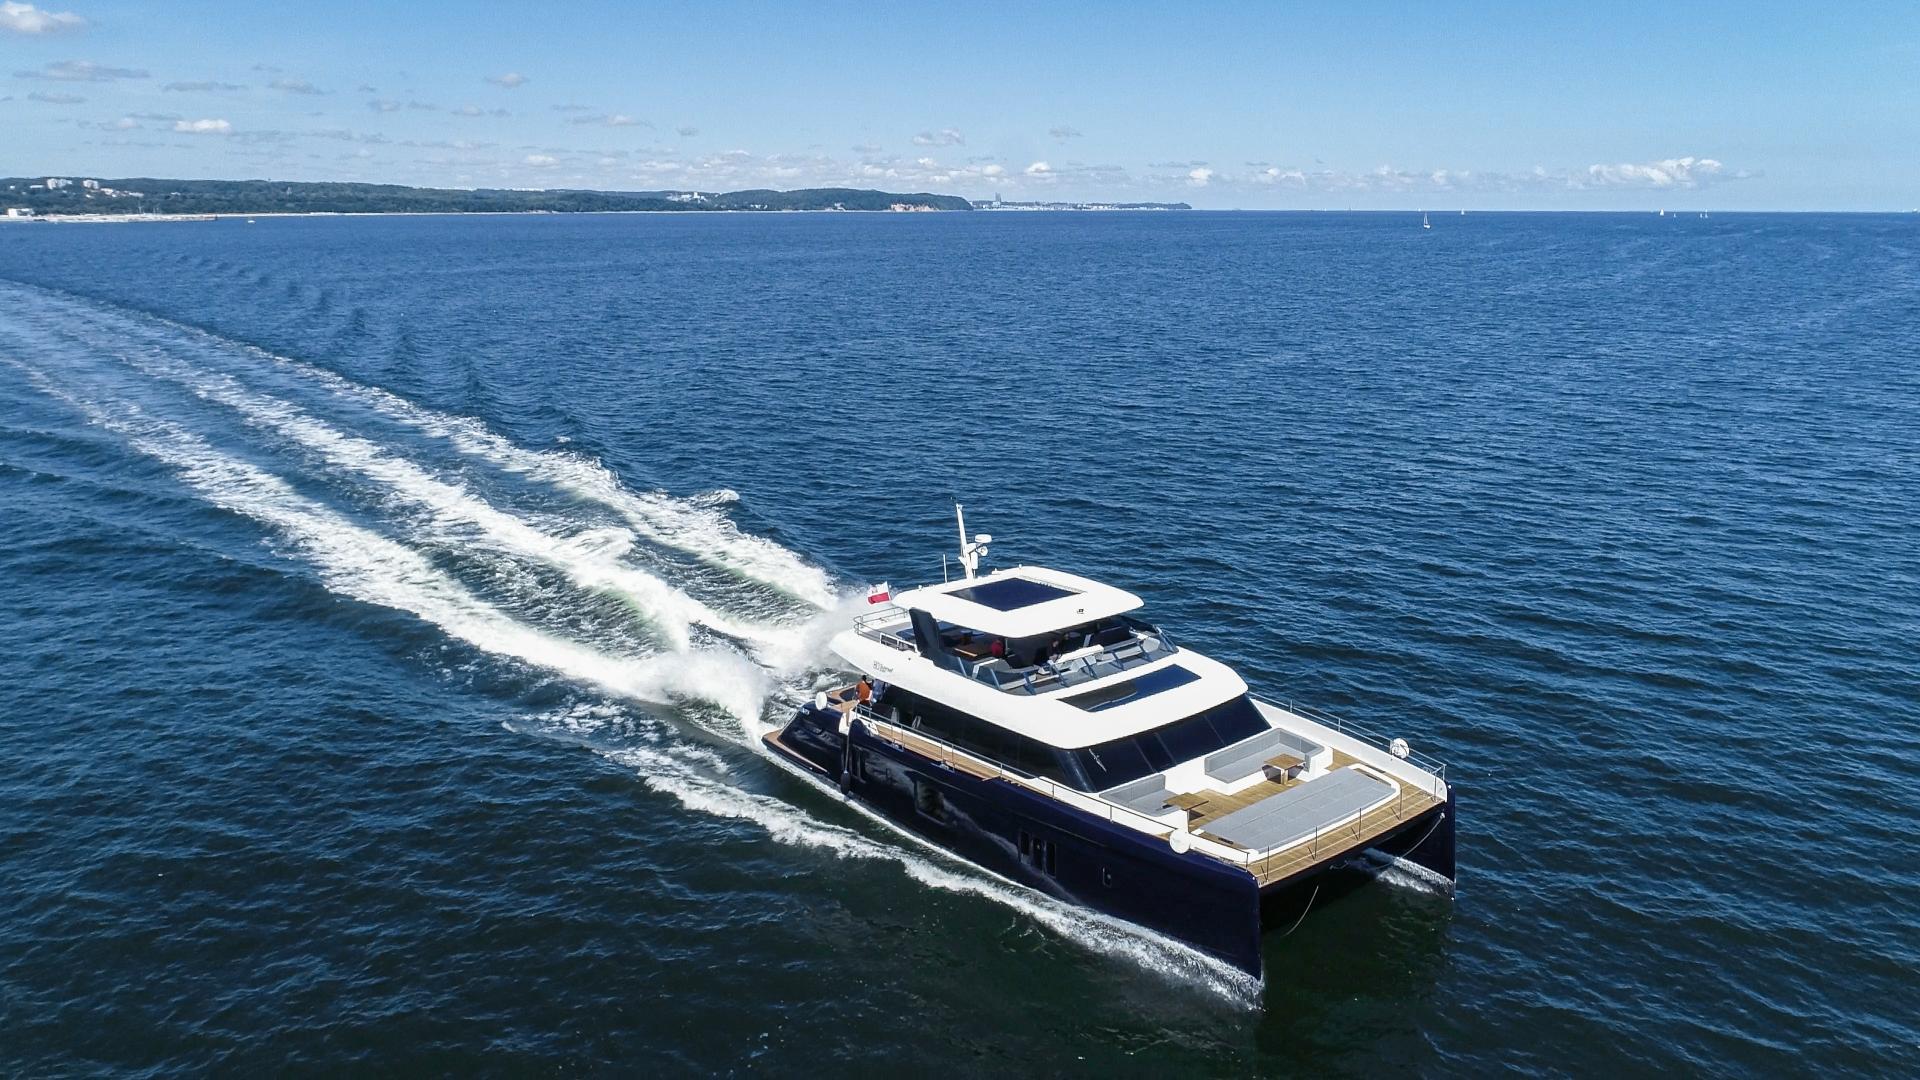 Poweras: modern technologies on luxury catamarans (photo, video)